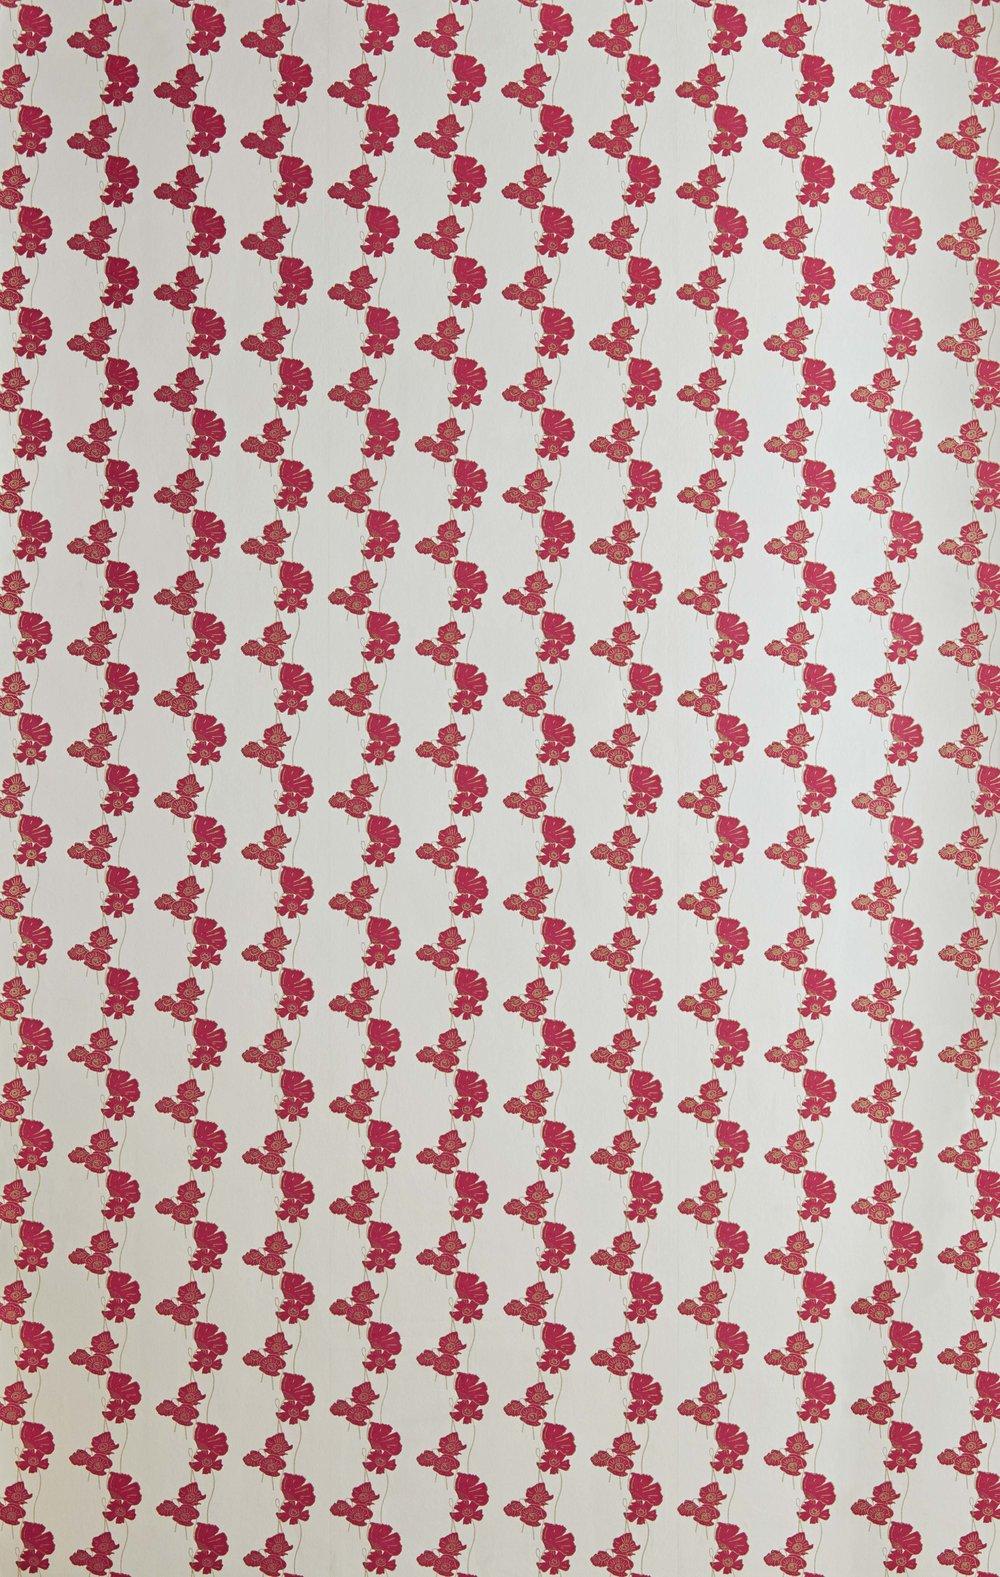 Barneby Gates - Poppy Fields - Red-Gold - Flat 3.jpg